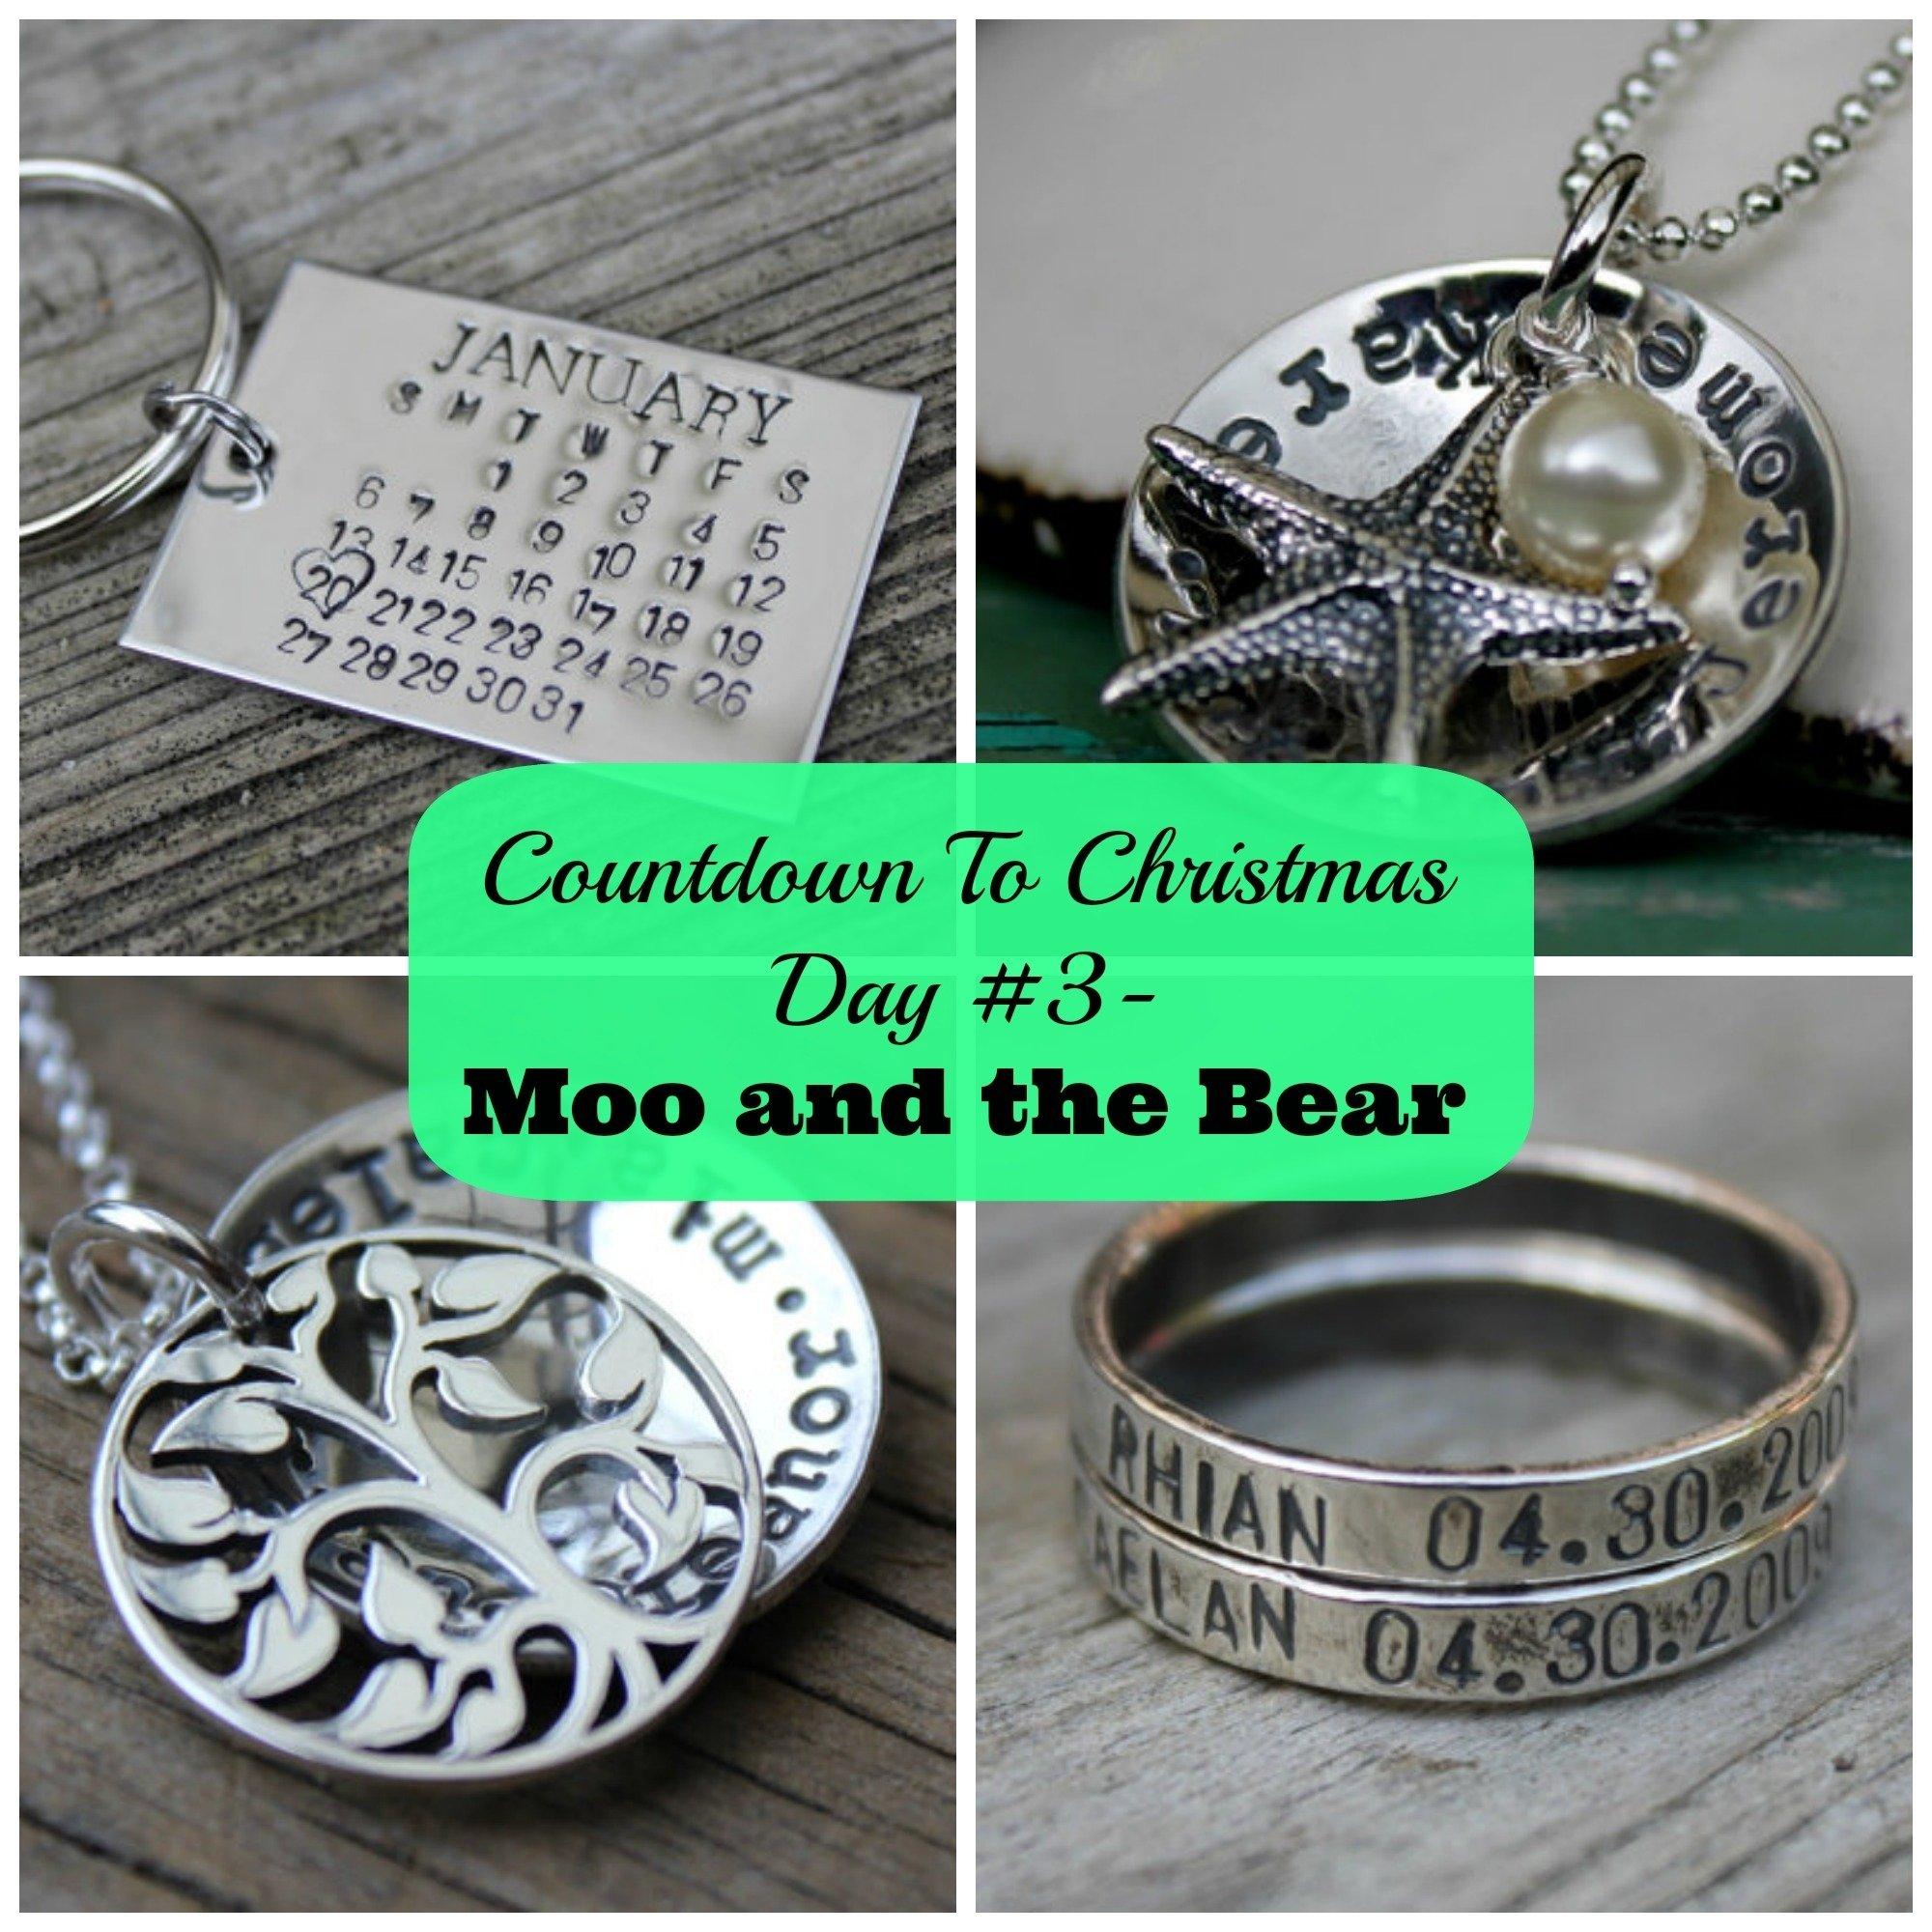 10 Beautiful Christmas Gift Ideas For Boyfriend gift ideas for boyfriend free gift ideas for boyfriend christmas 4 2021